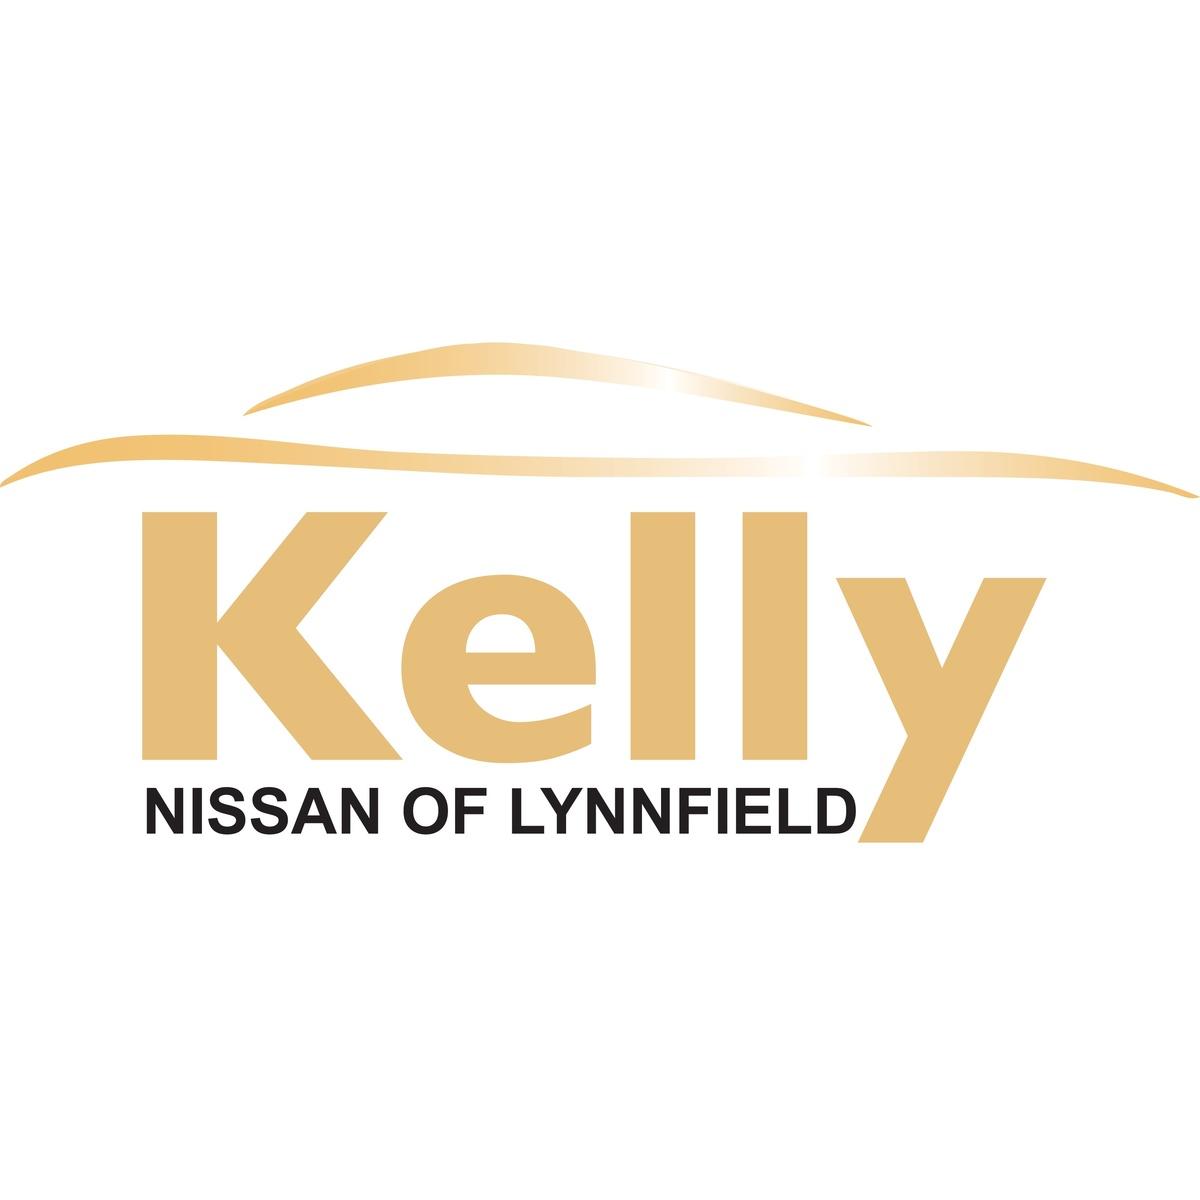 Kelly Nissan of Lynnfield - Lynnfield, MA: Read Consumer reviews ...